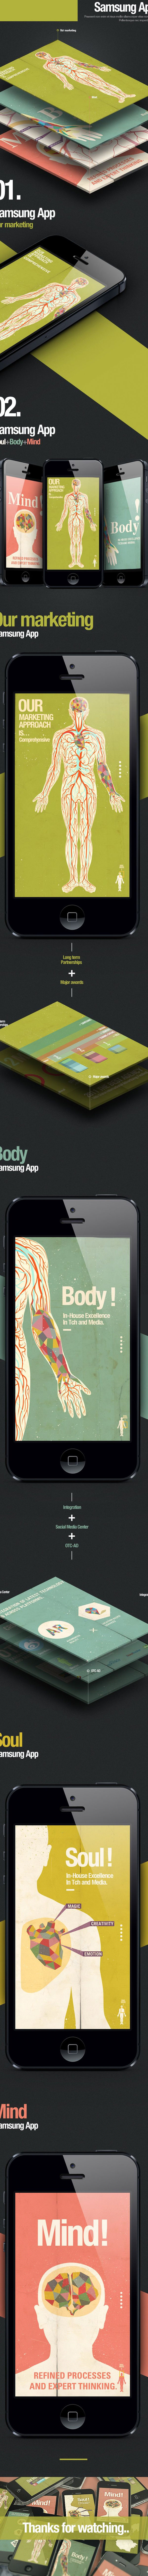 +Samsung app+ by Rockblue , via Behance